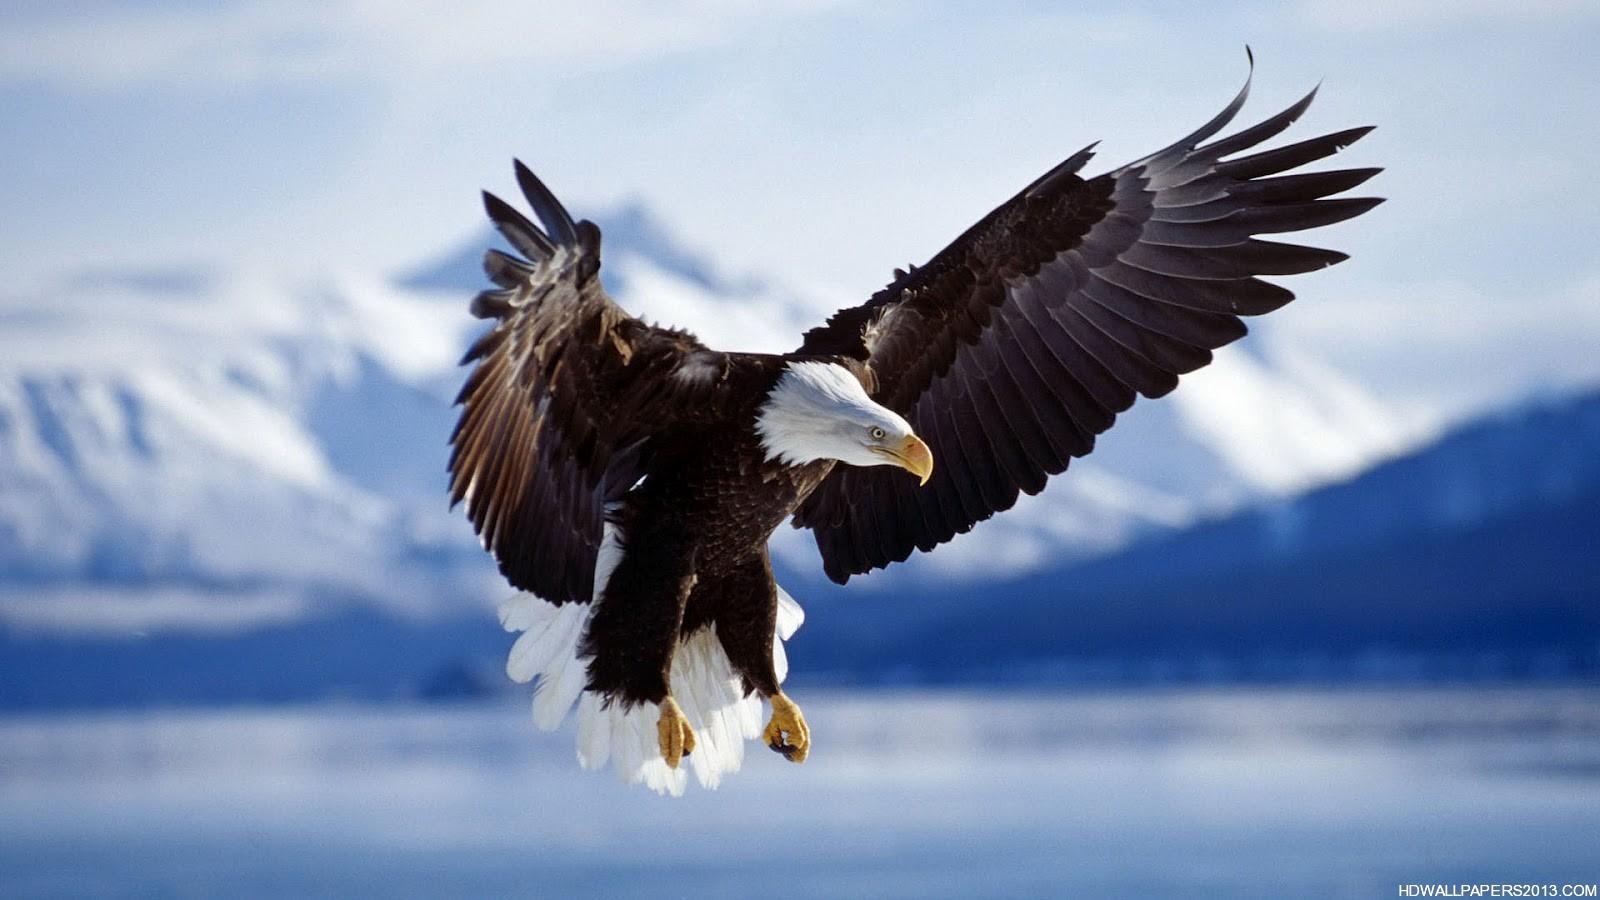 eagle wallpaper hd hd wallpapers eagle wallpaper hd hd background 1600x900